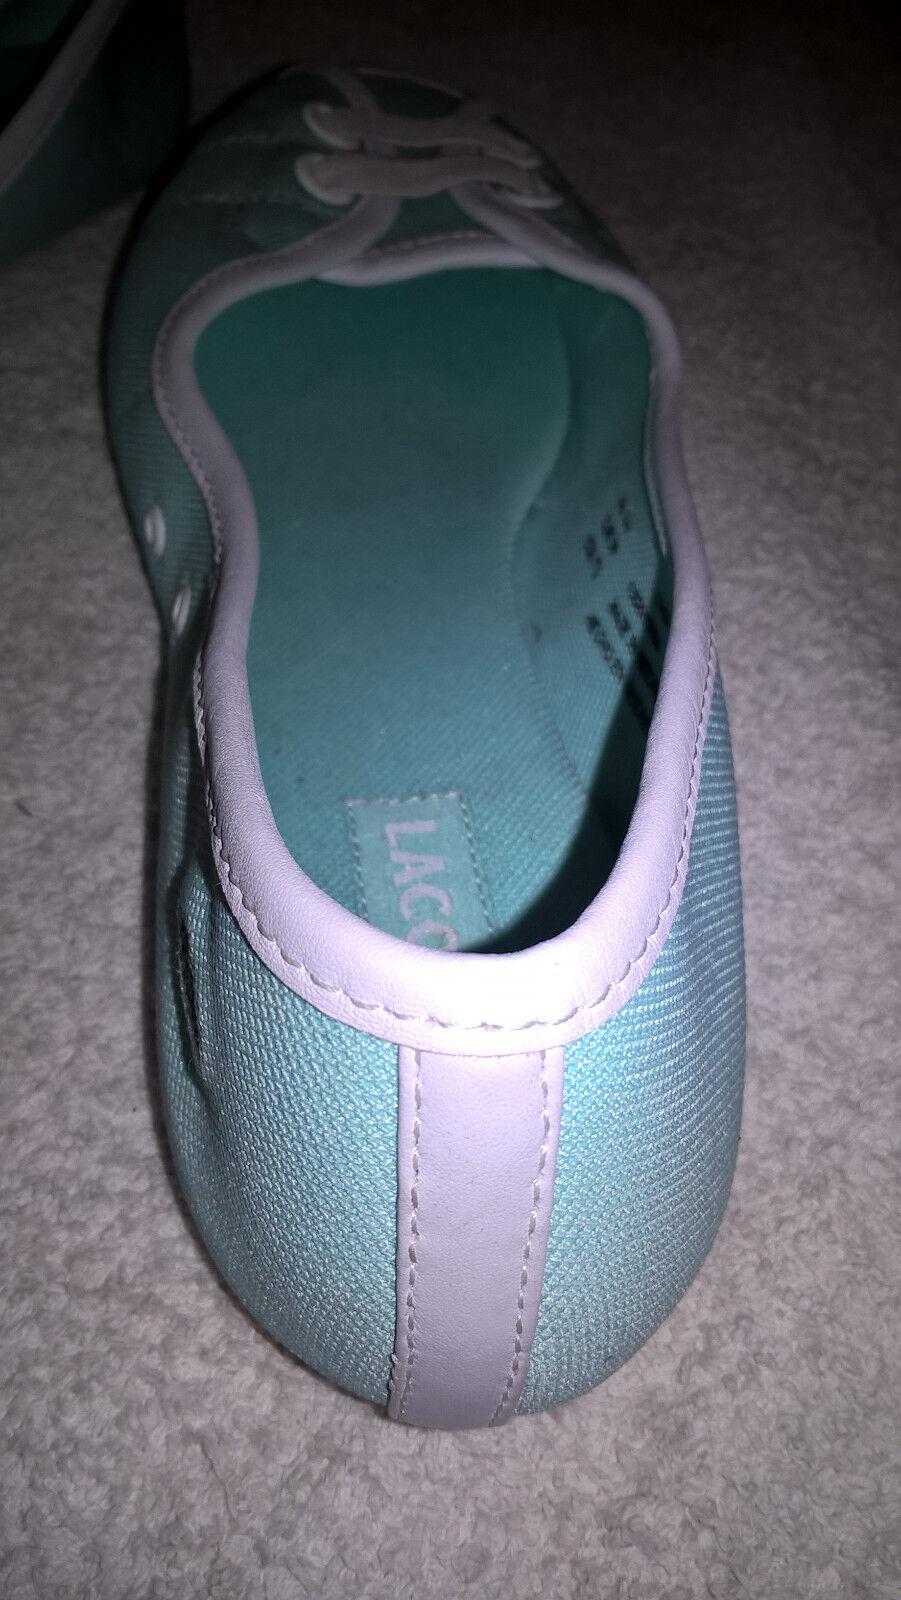 Genuine Lacoste Damens's shoe, UK USA 5 1/2, Eur 38, USA UK 7 1/2 7c5f19